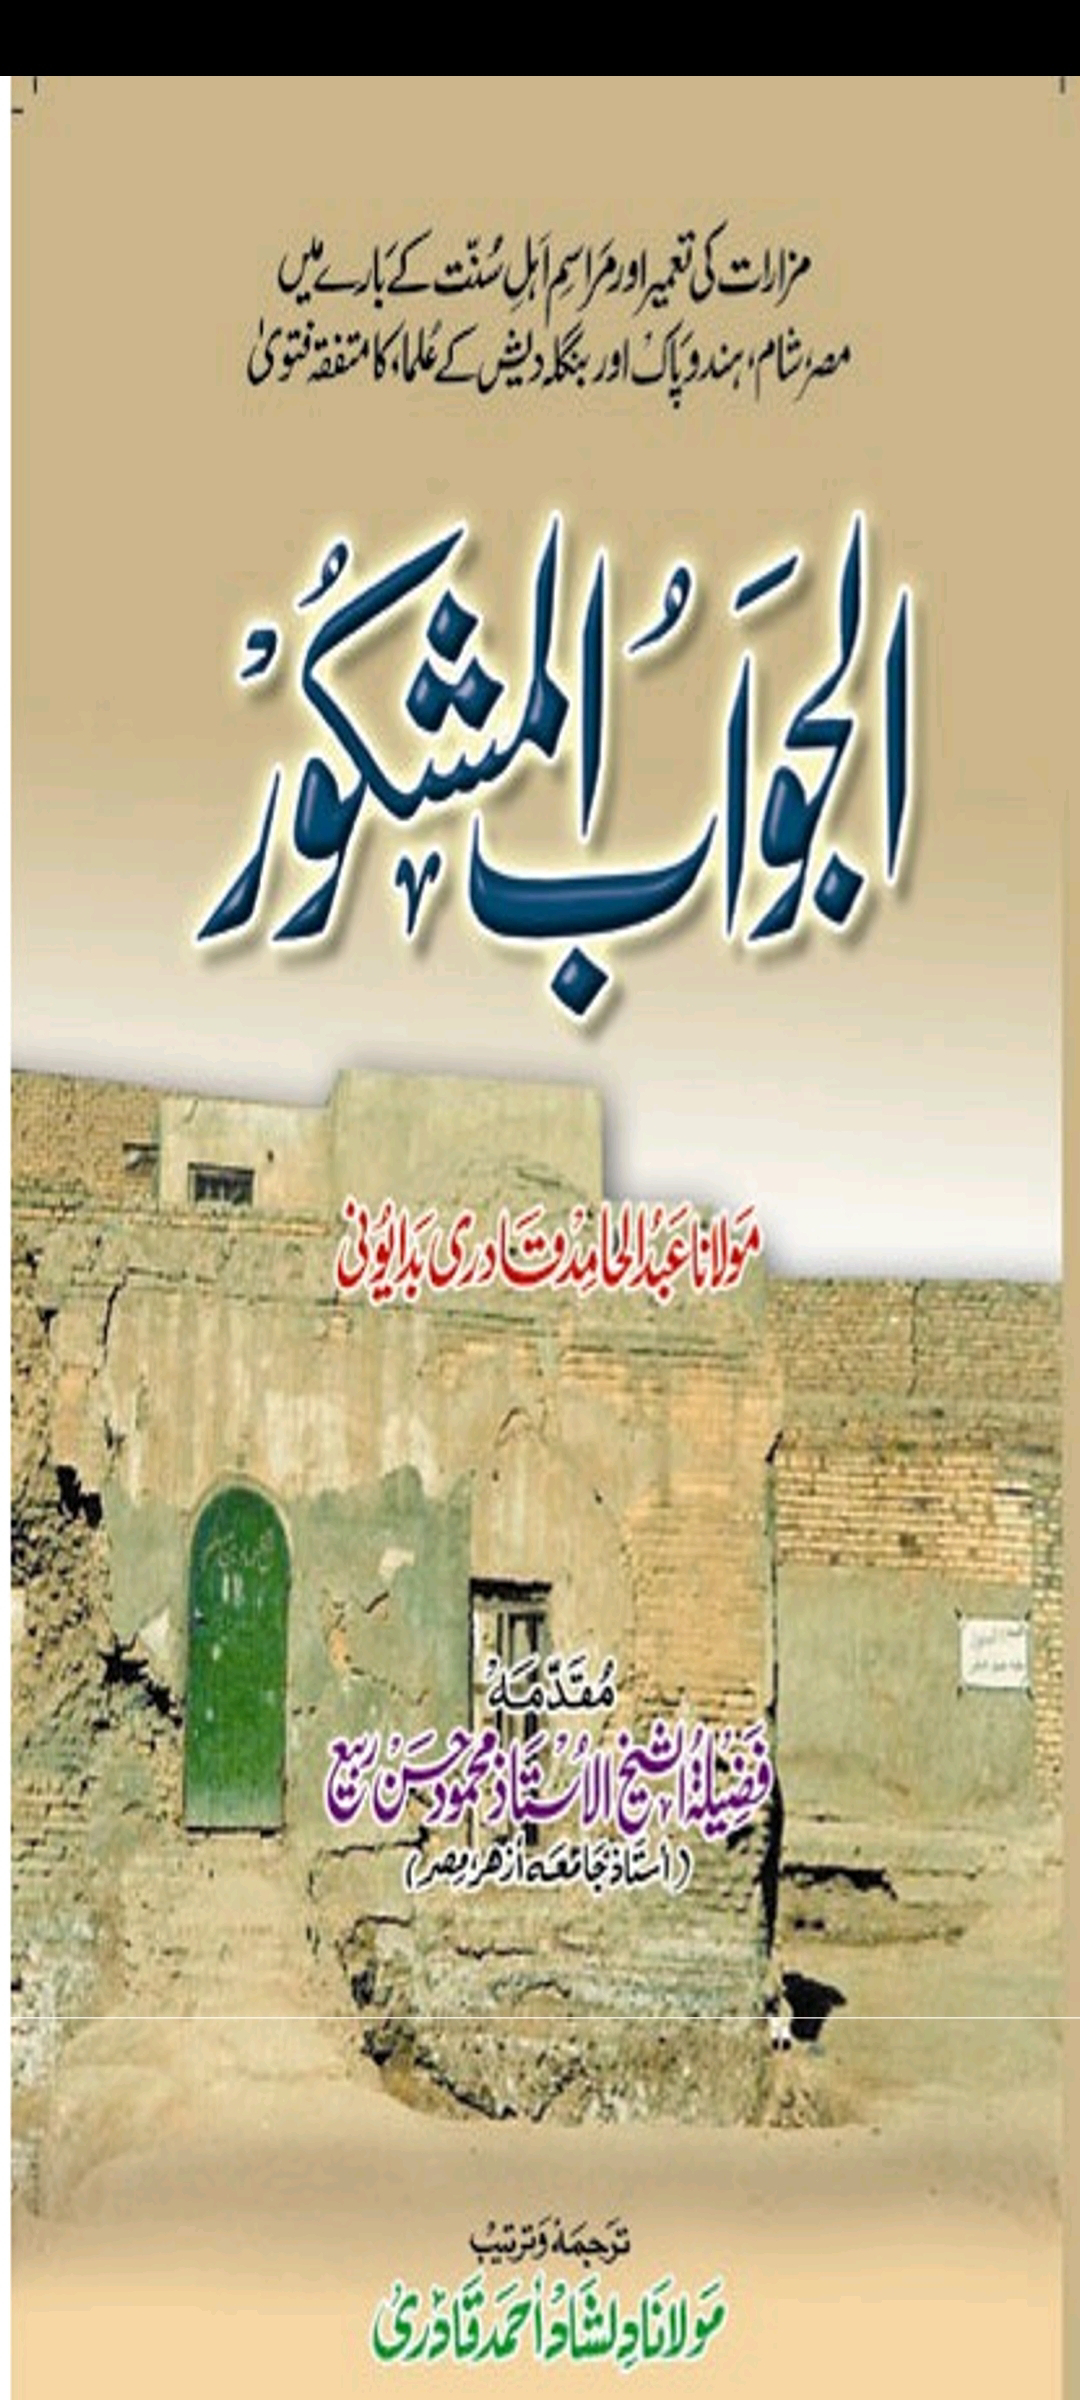 Aljawab Ul Mashkoor / الجواب المشکورby مولانا عبدالحامد قادری بدایونی